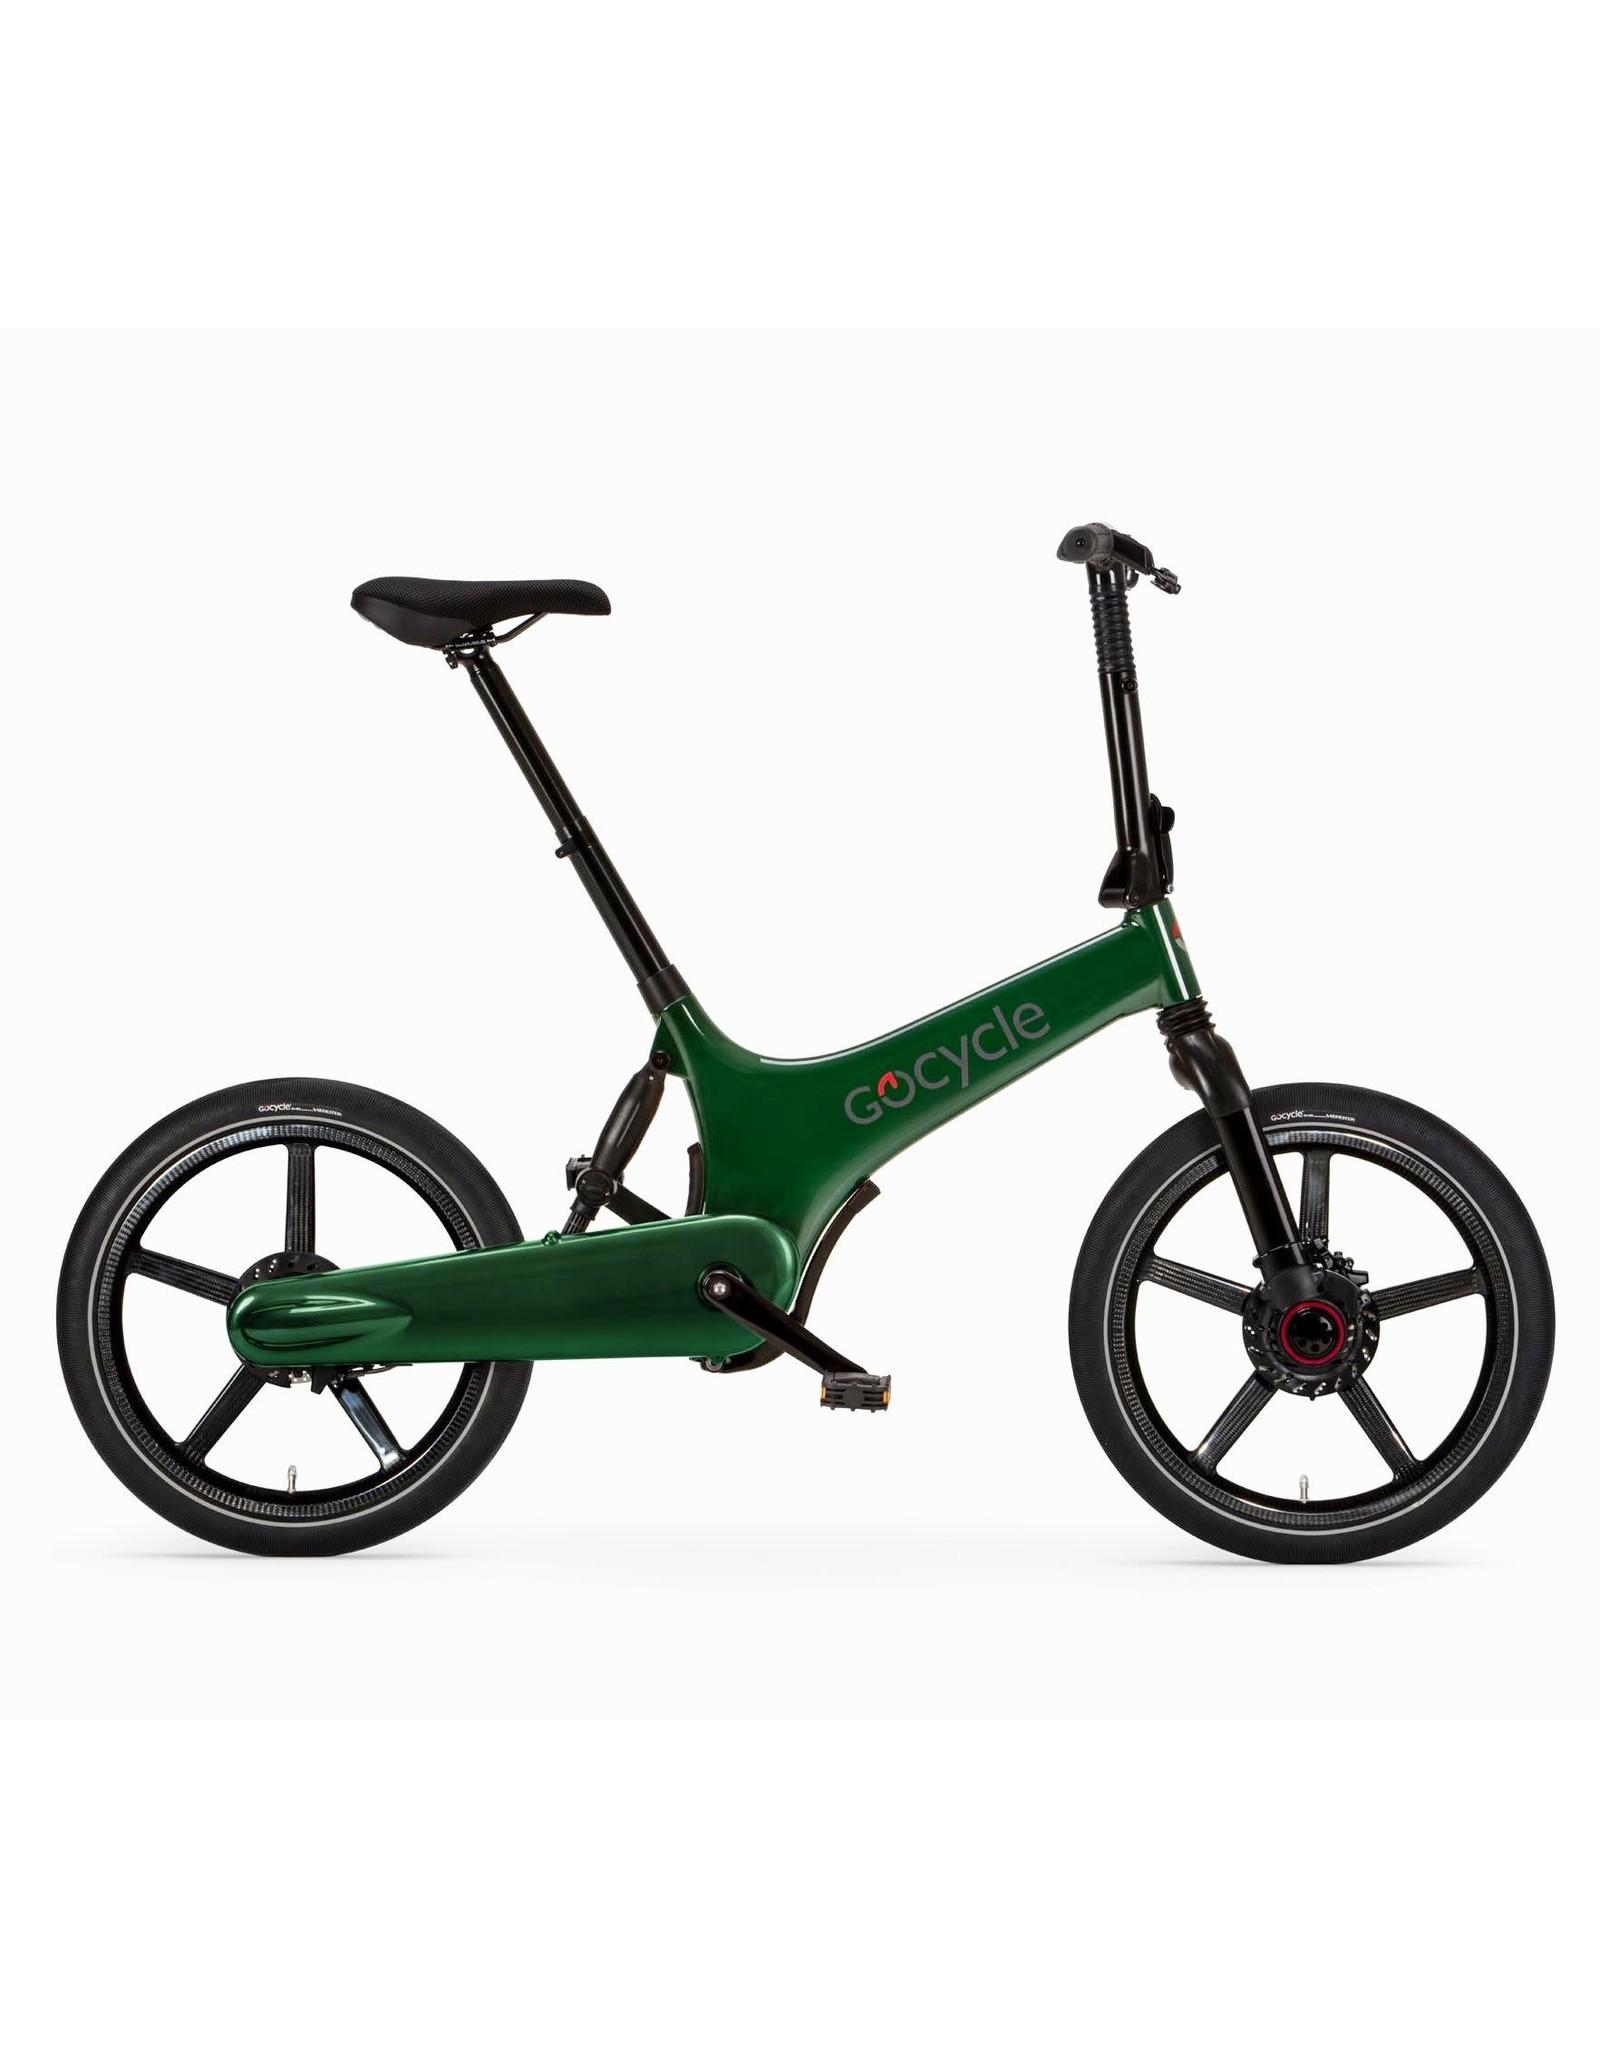 Gocycle GoCycle G3+ folding electric bike green